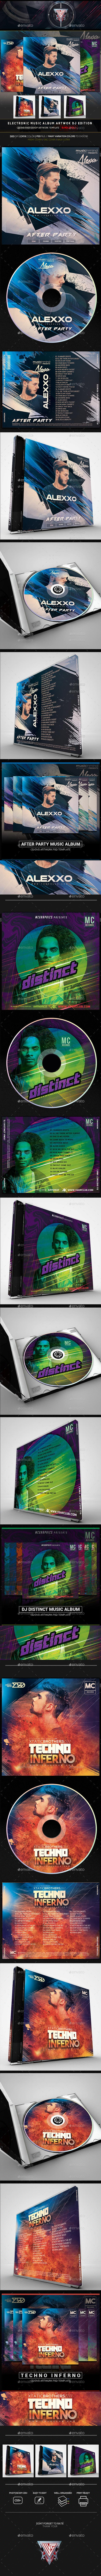 Electro Music Album Artworks CD/DVD Template Bundle Vol.1 DJ Edition - CD & DVD Artwork Print Templates